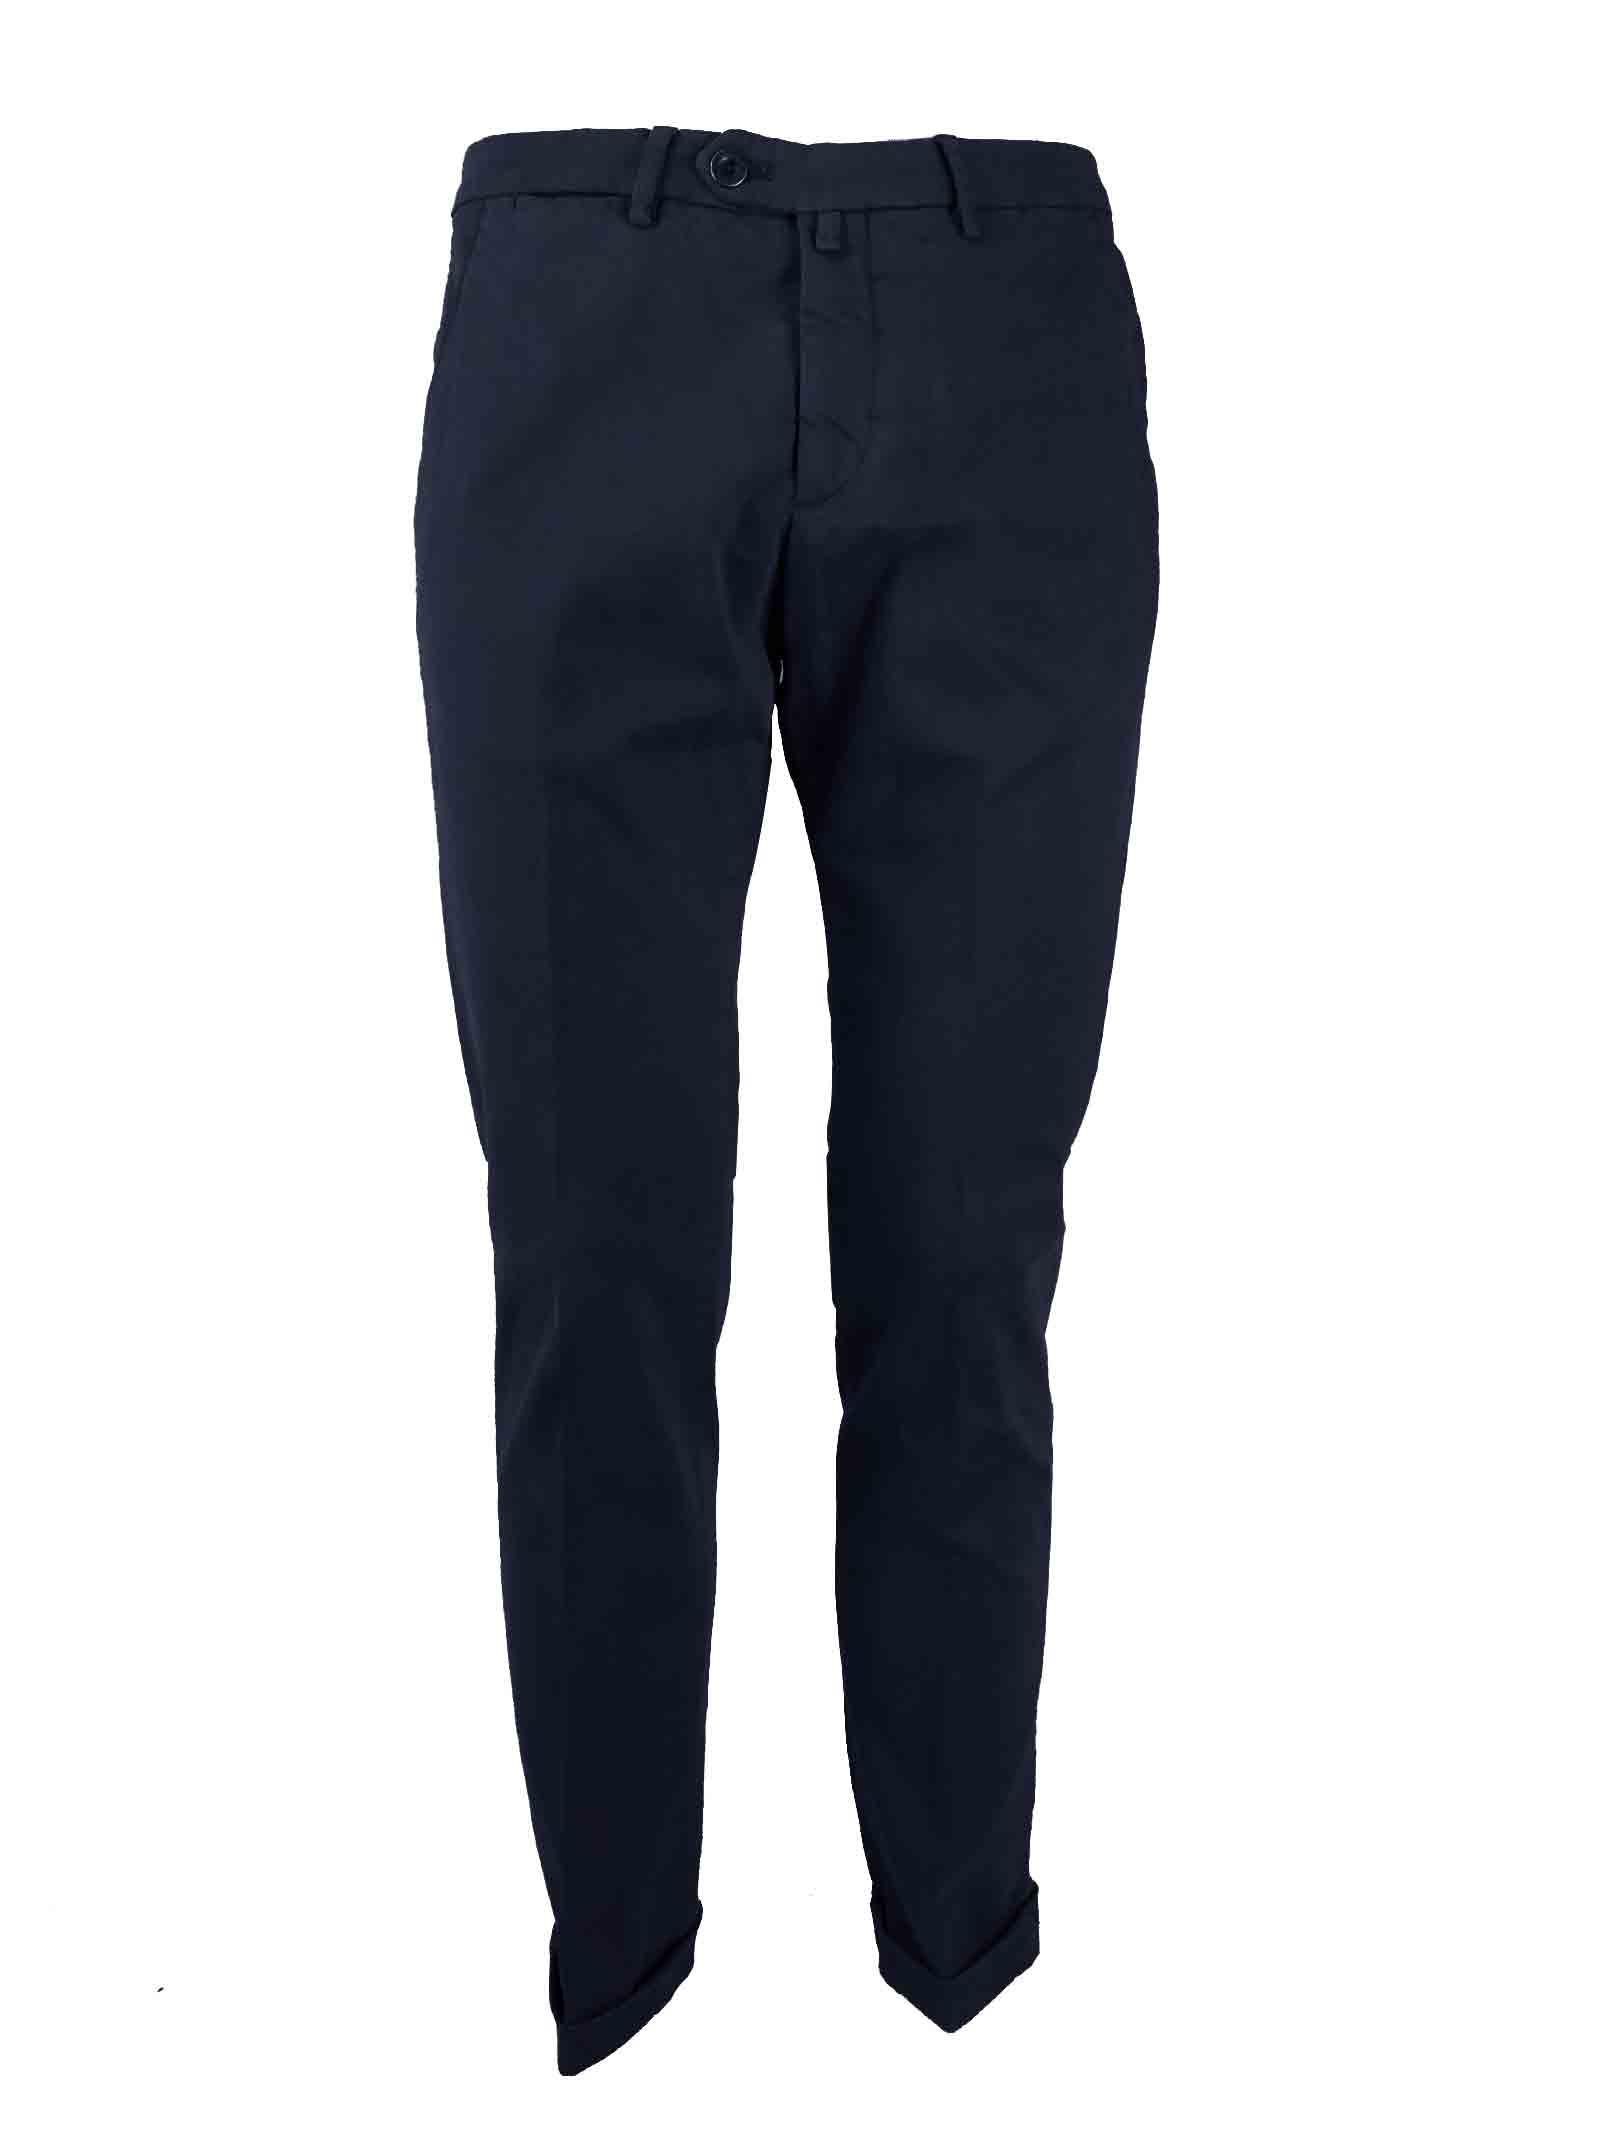 B700 | Trousers | MH700 802991